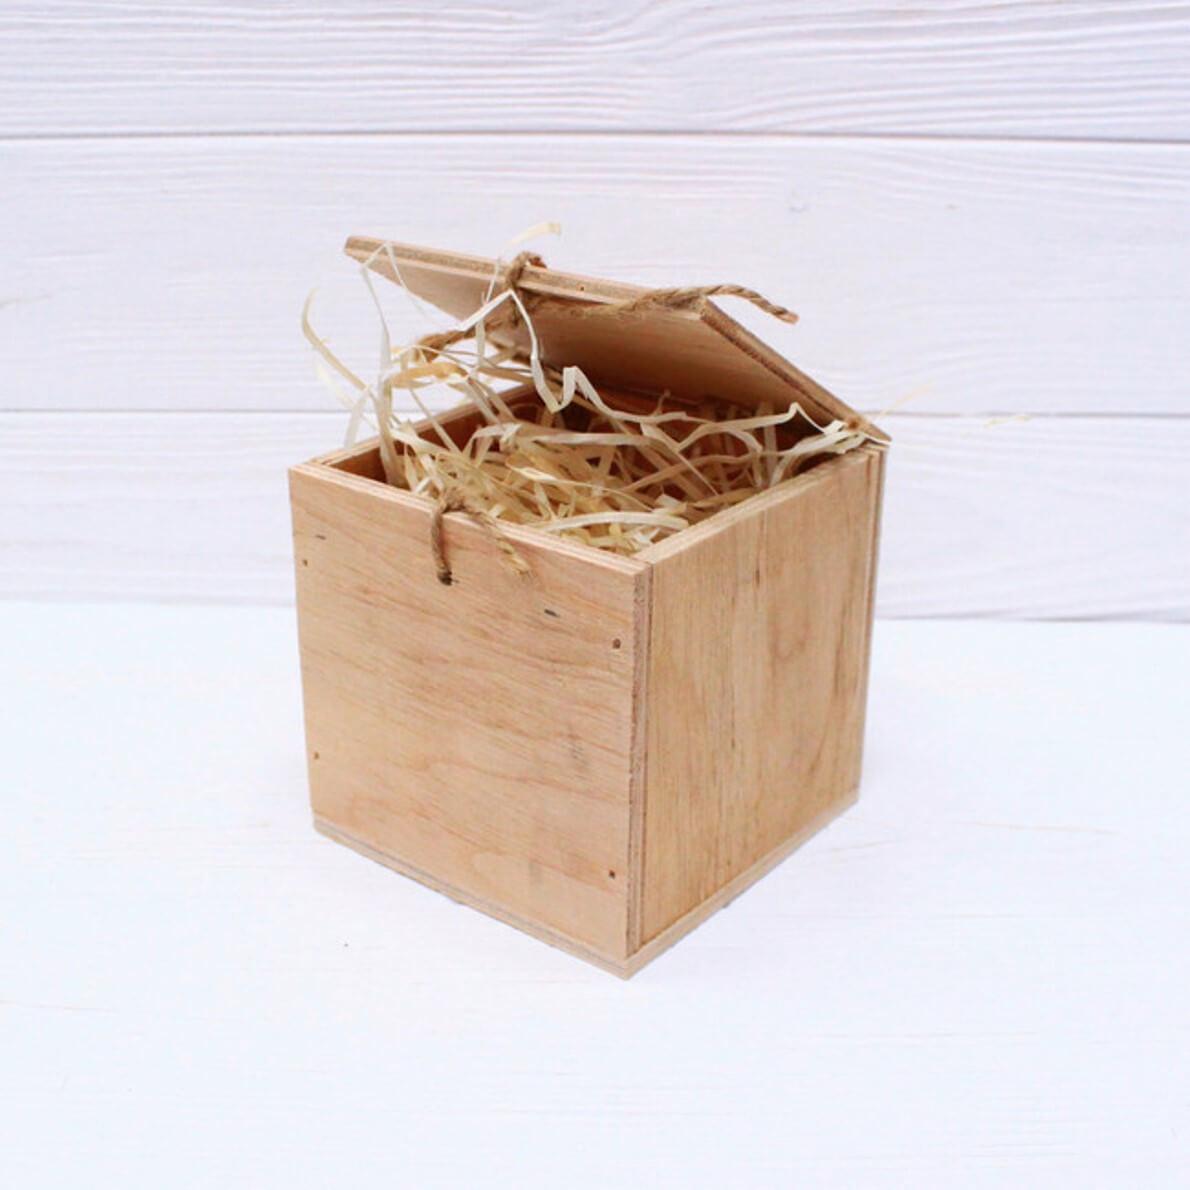 Онлайн каталог PROMENU: Подарочная коробка Гастромайстерня Конфiтюр 24